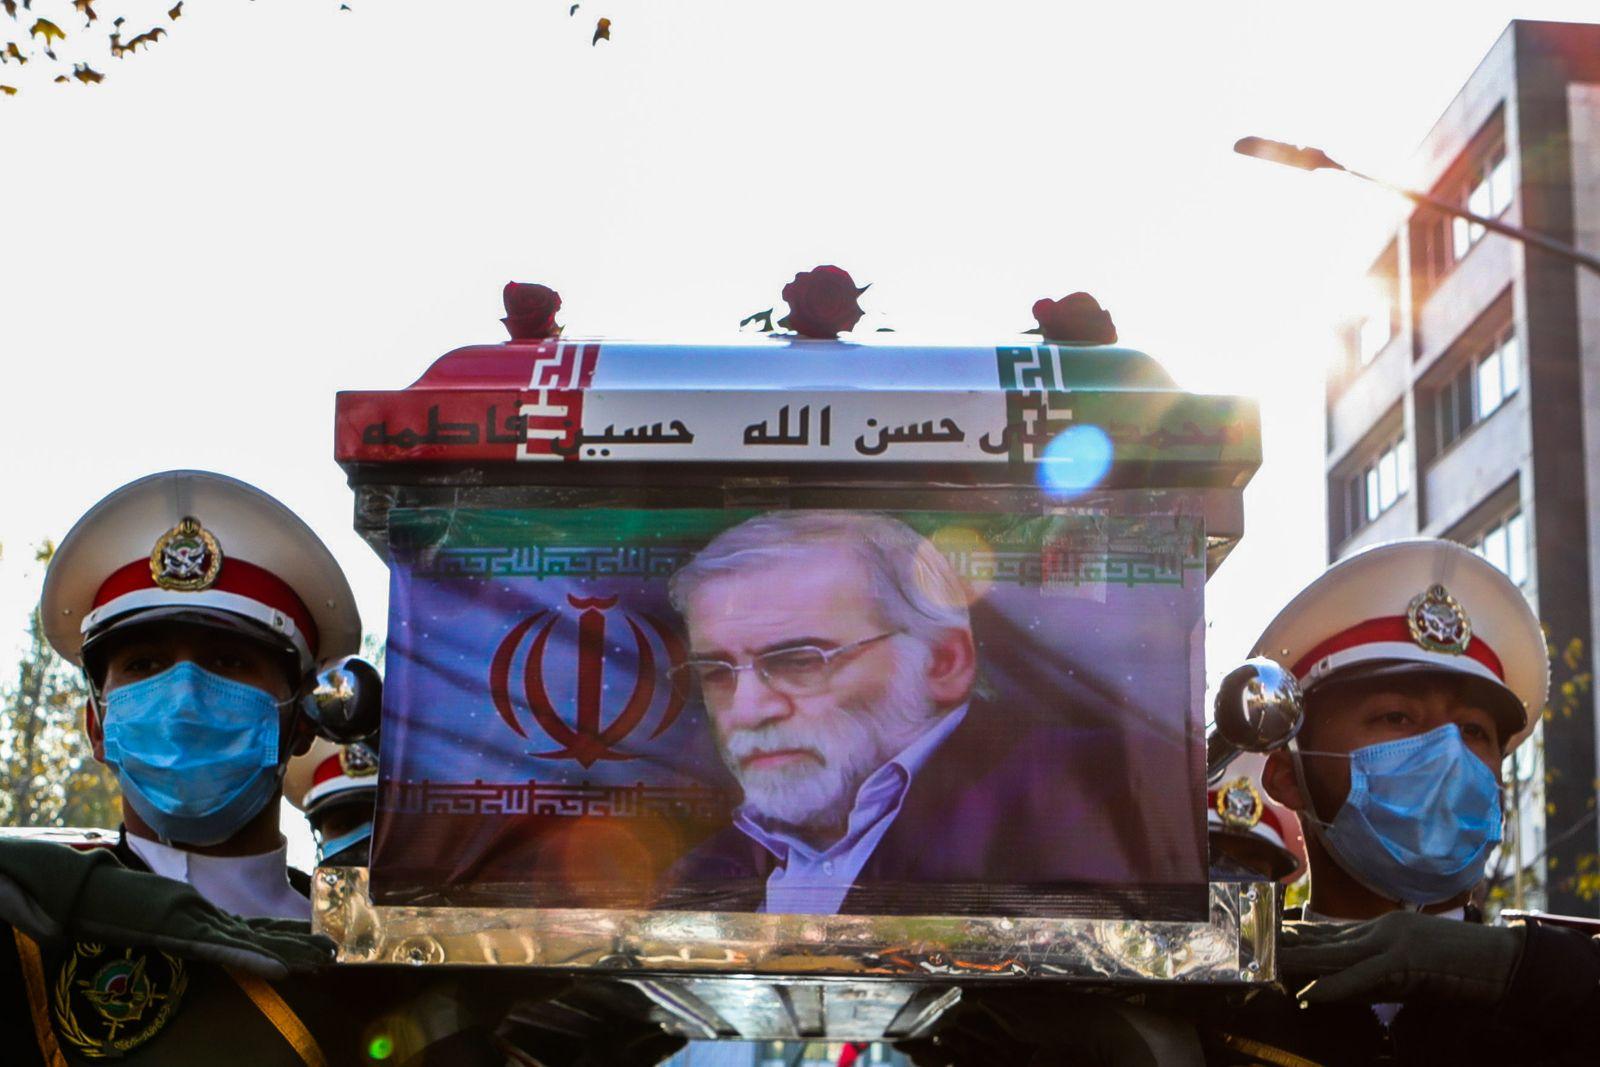 Funeral of assassinated Iranian nuclear scientist, Qom, Iran Islamic Republic Of - 20 Apr 2016